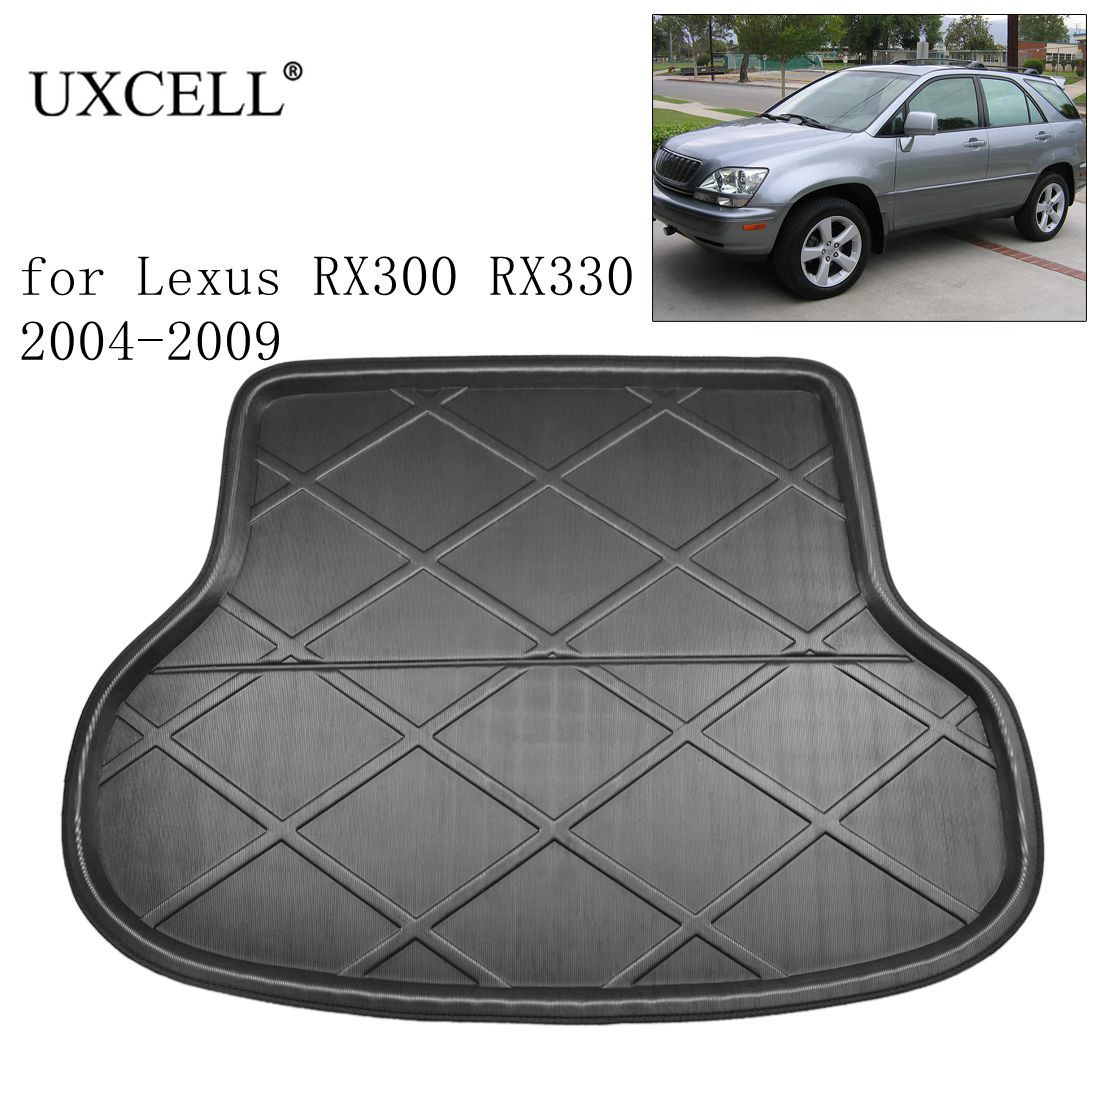 UXCELL PE+EVA Foam Plastic Rear Car Trunk Boot Liner Cargo Mat Floor Tray Cover Pad For Lexus RX300 RX330 RX270 RX350 2004-2015